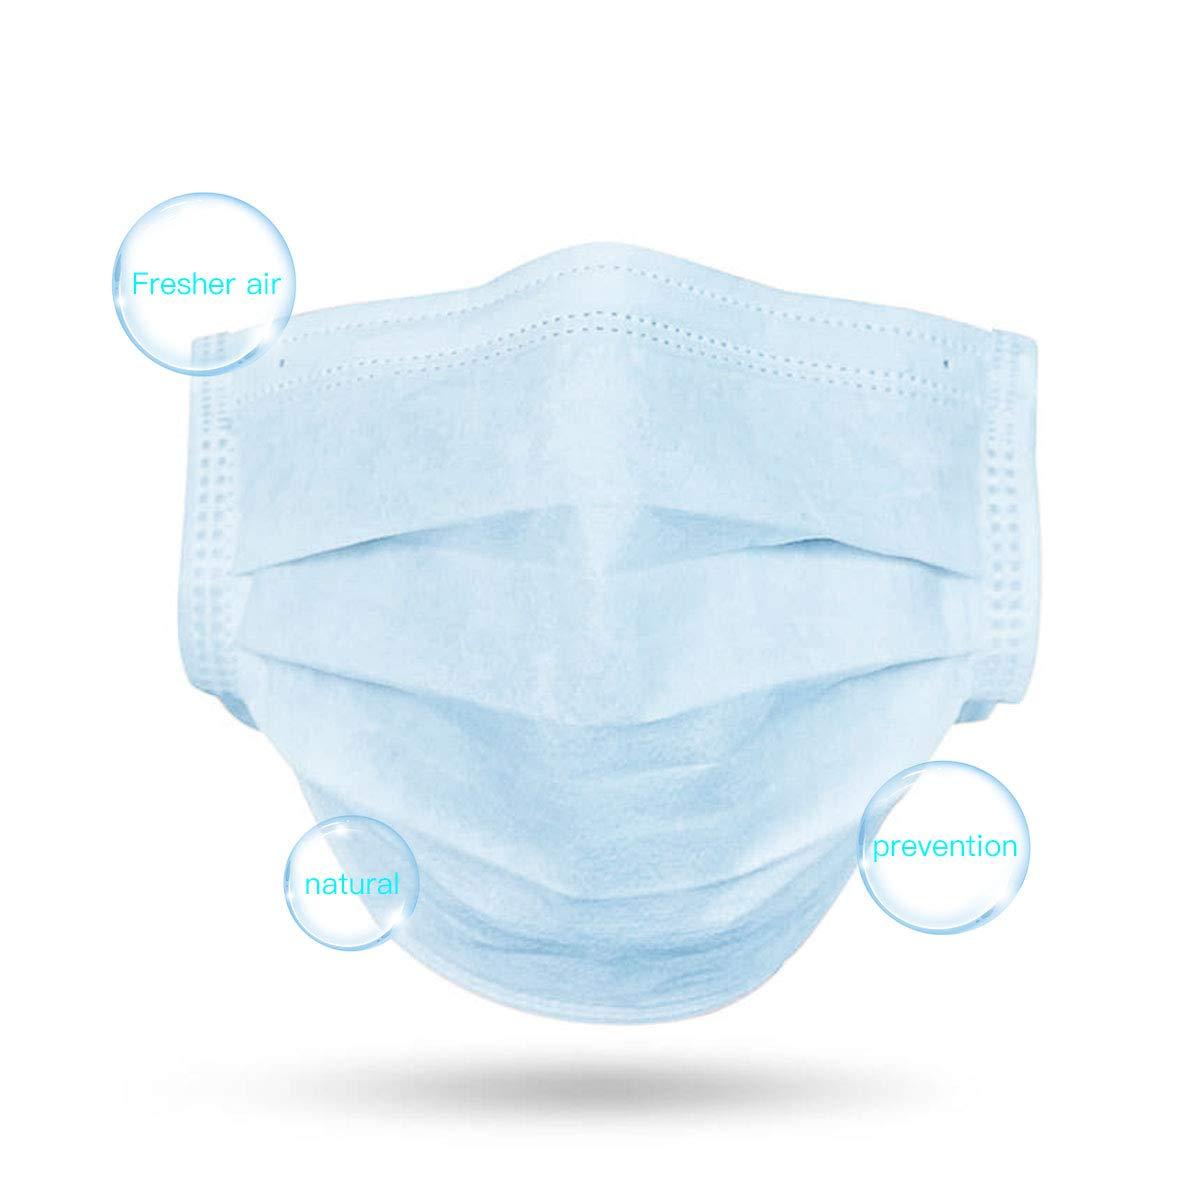 Image 2 - 5/10/20/50pcs 3 layer Disposable Non Woven Masks Filter Medical  Dustproof PM2.5 Mouth Nose Anti Coronavirus face Masks FFP3  -